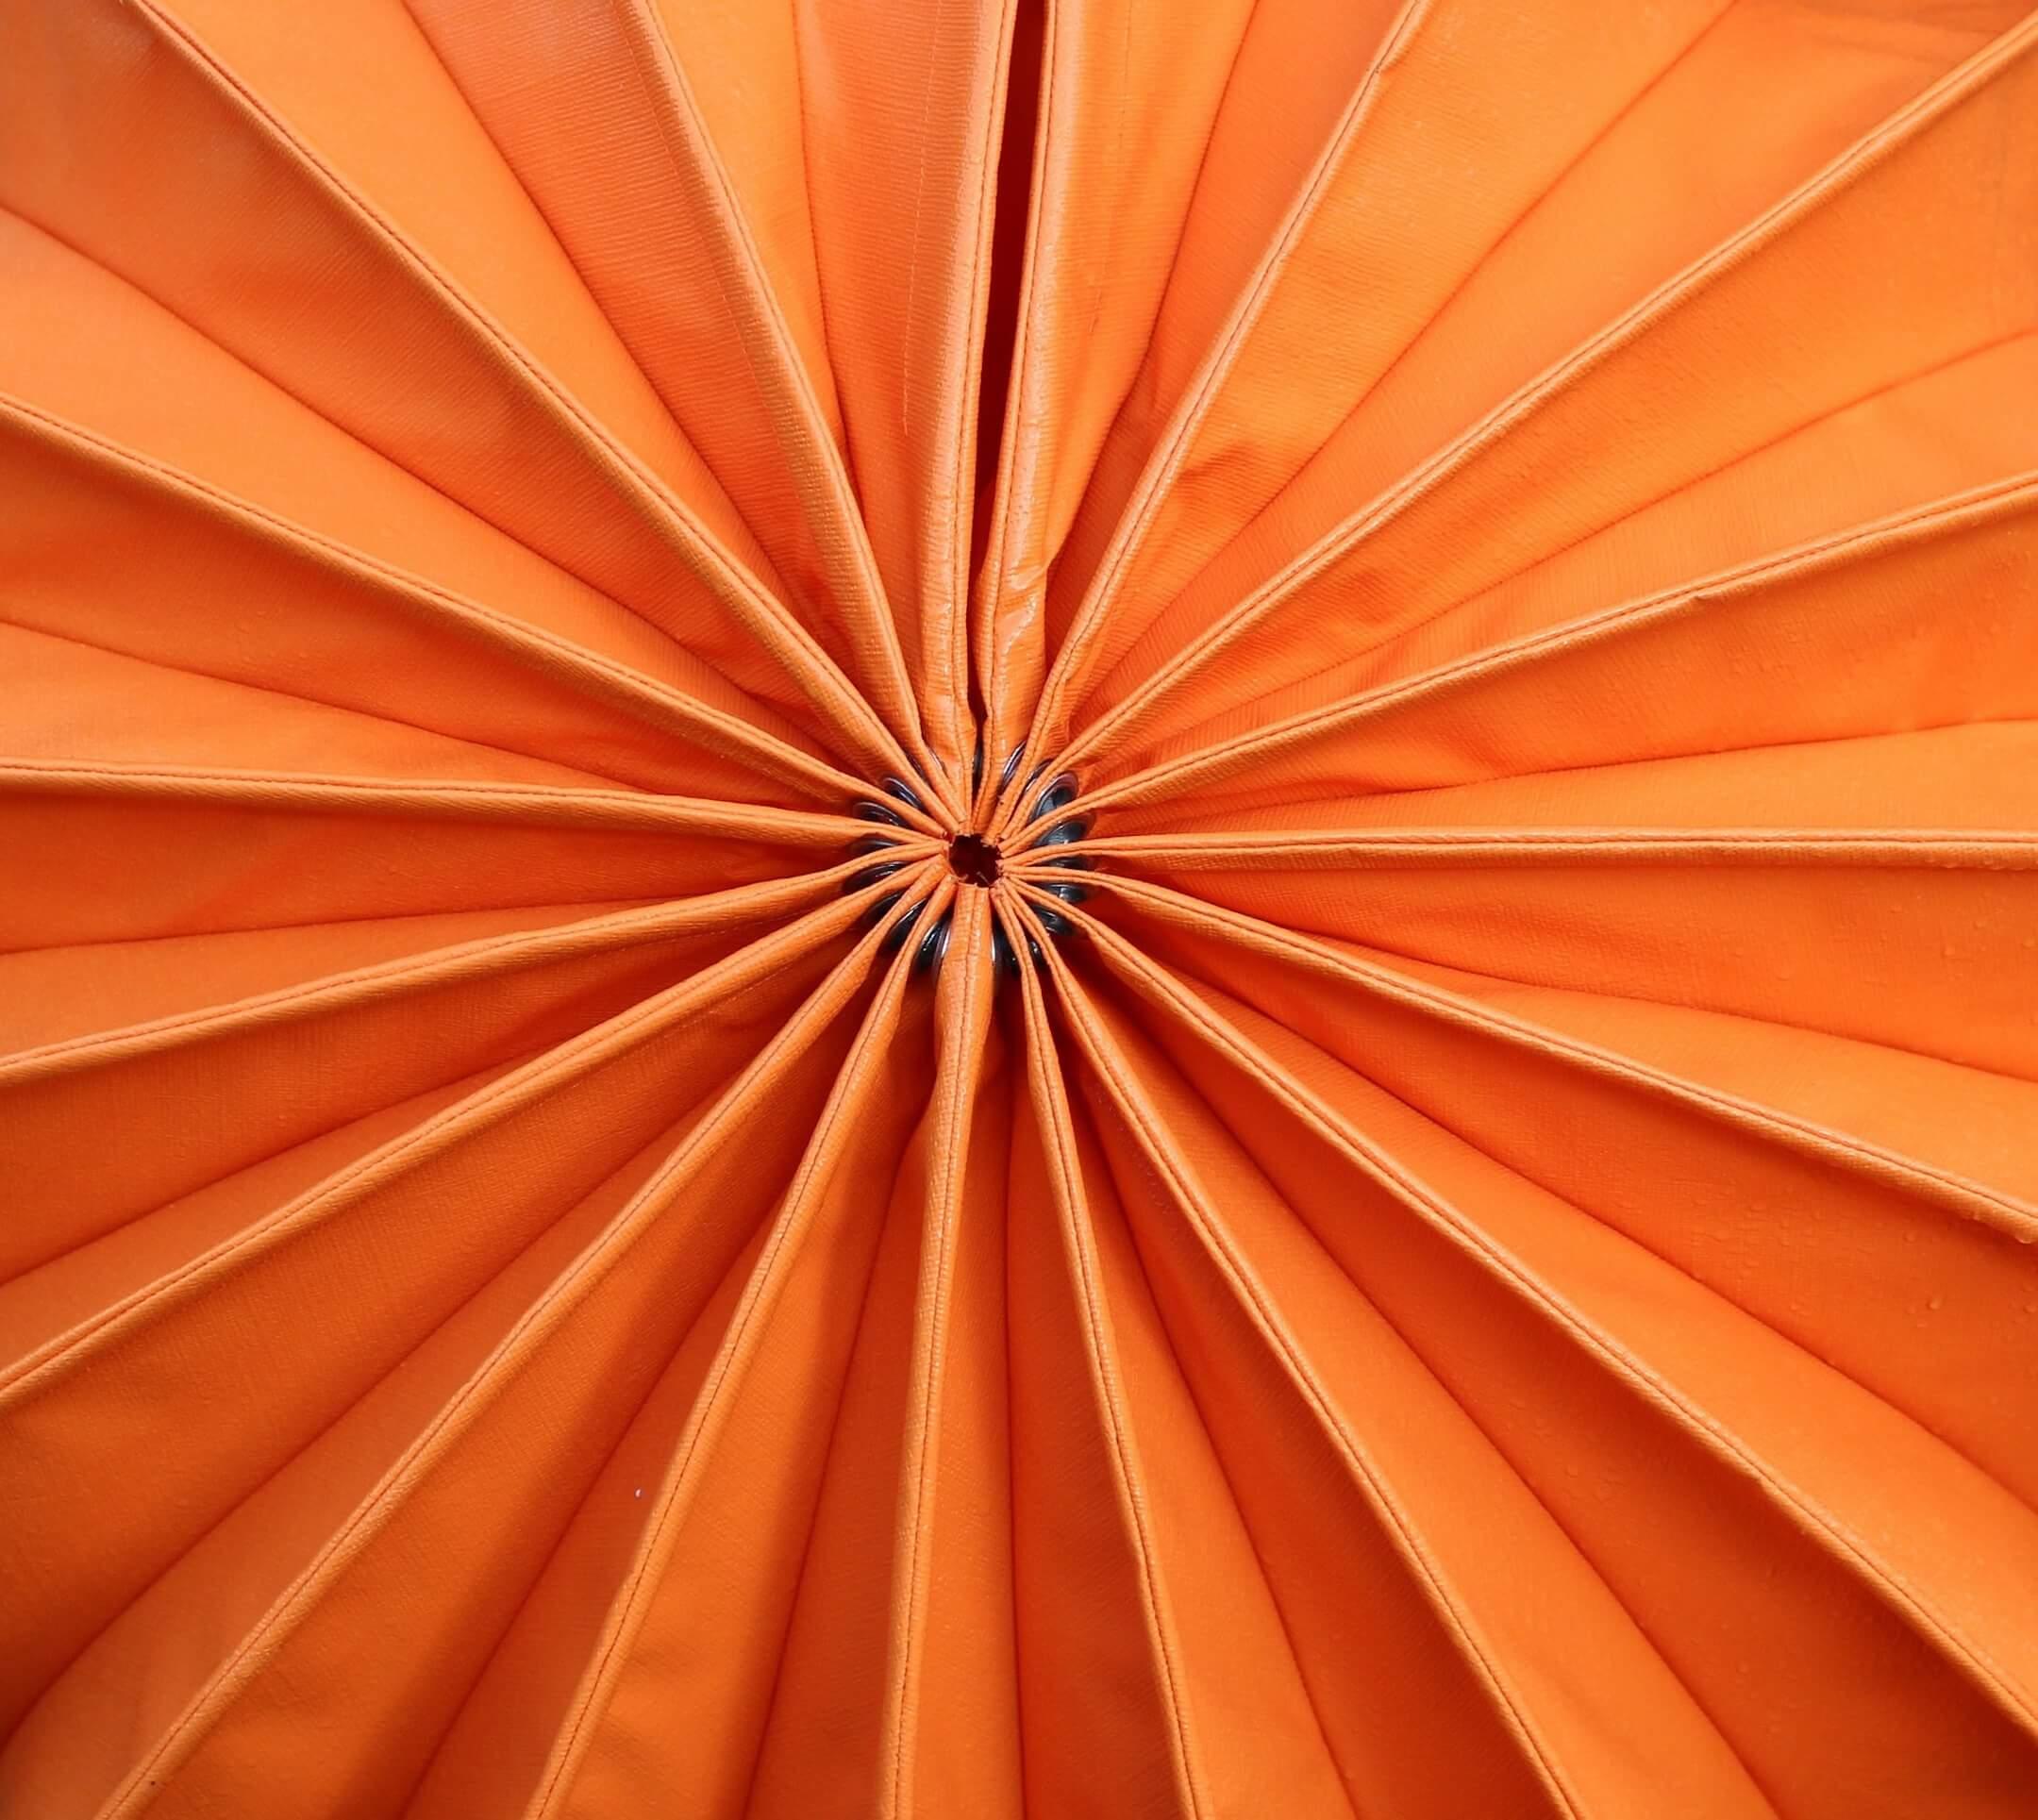 orange chapter 1